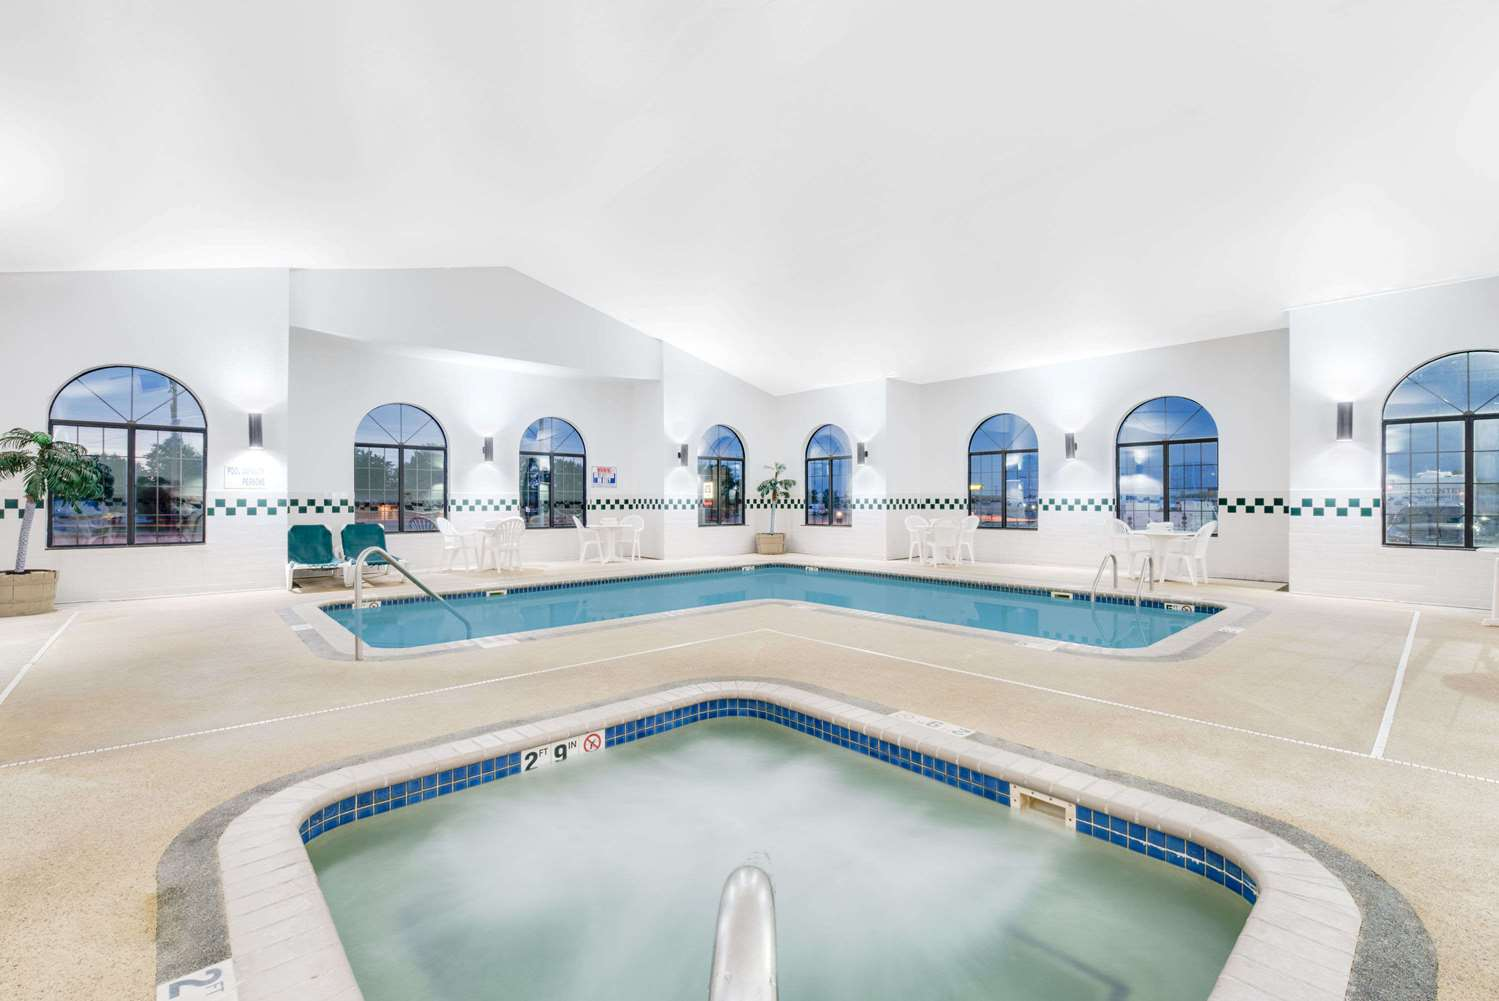 Pool - Super 8 Hotel Sisseton